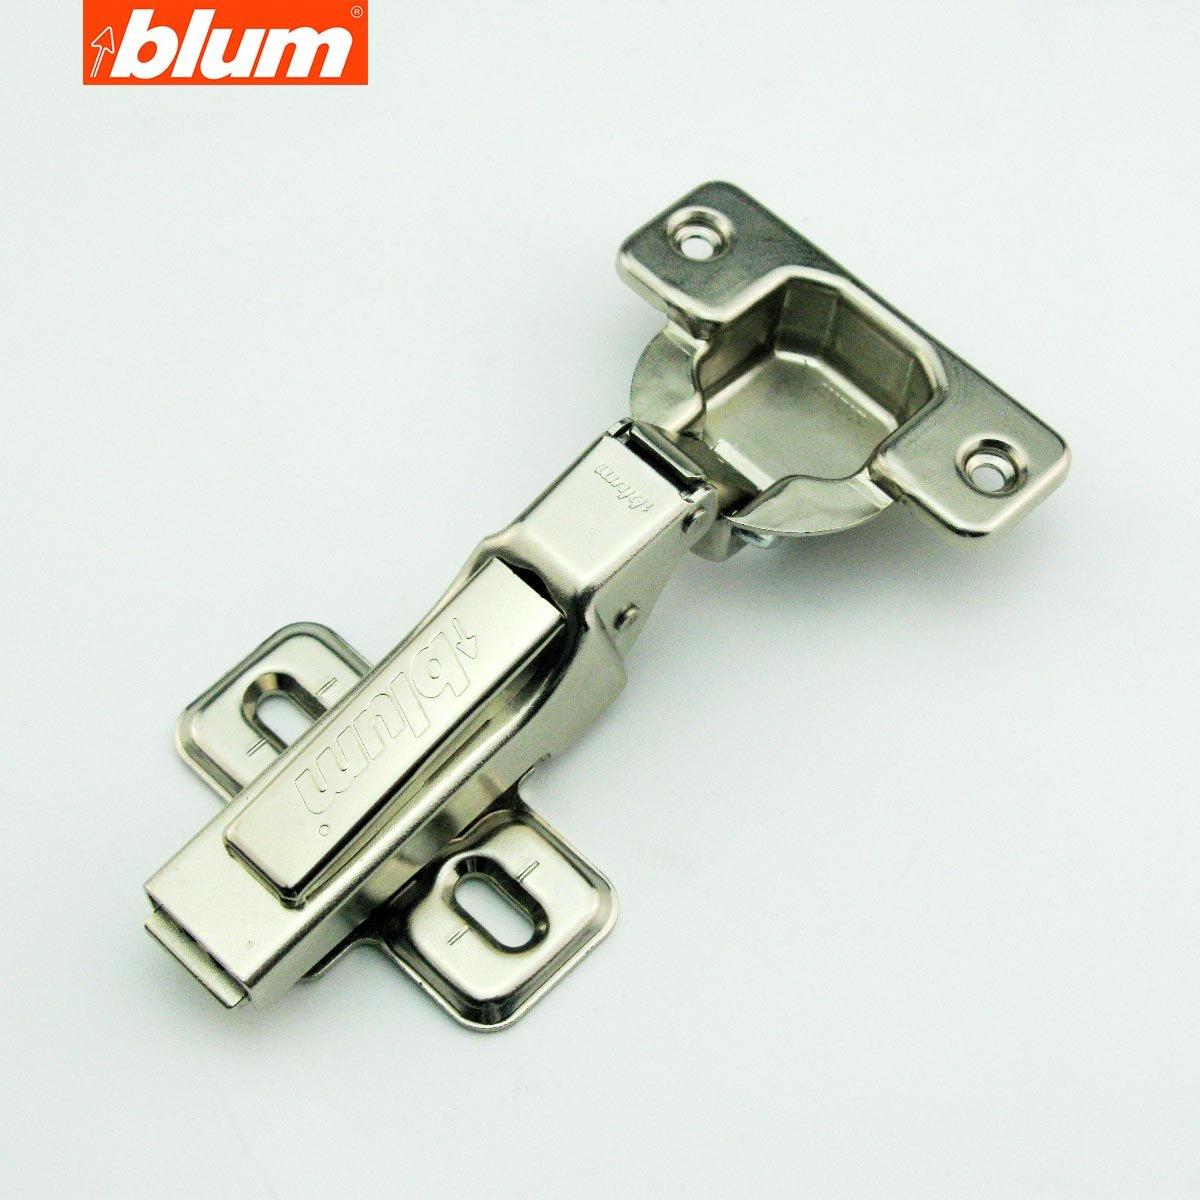 8er Set) Blum Clip Top 100° Mittelanschlag Standardscharnier 71M2650 ...